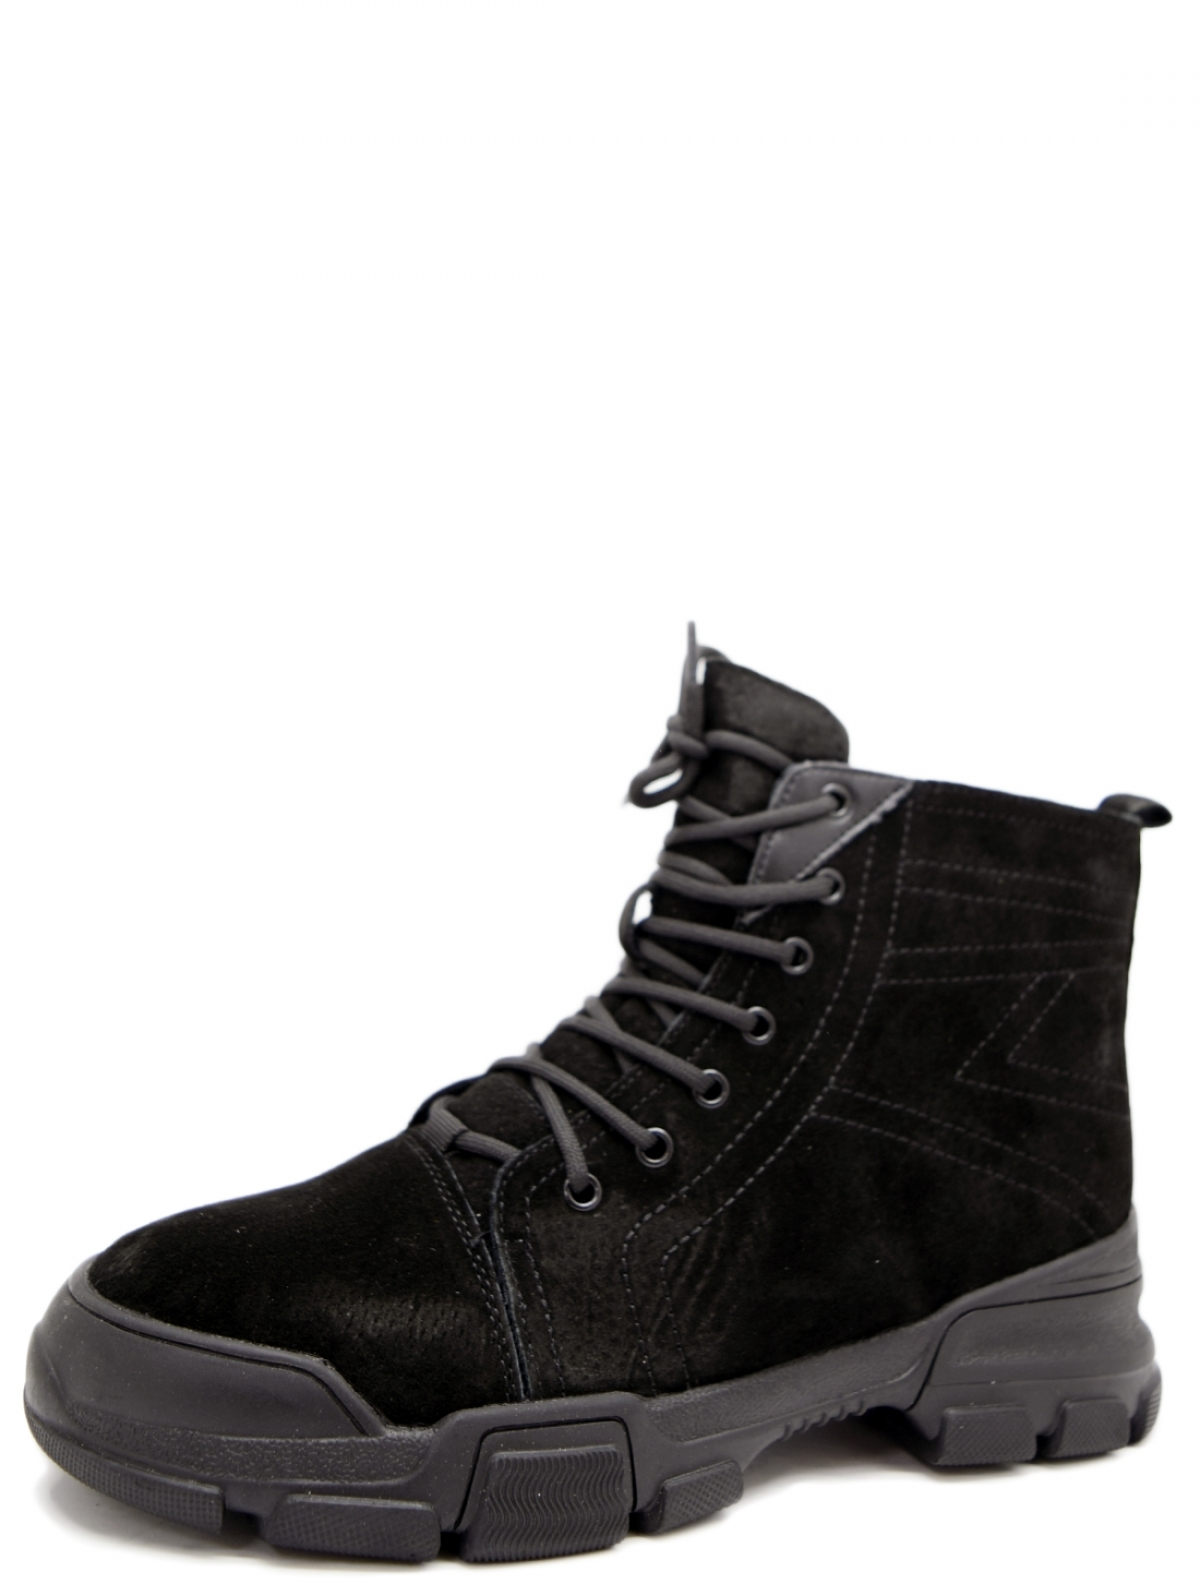 Baden RW017-020 женские ботинки